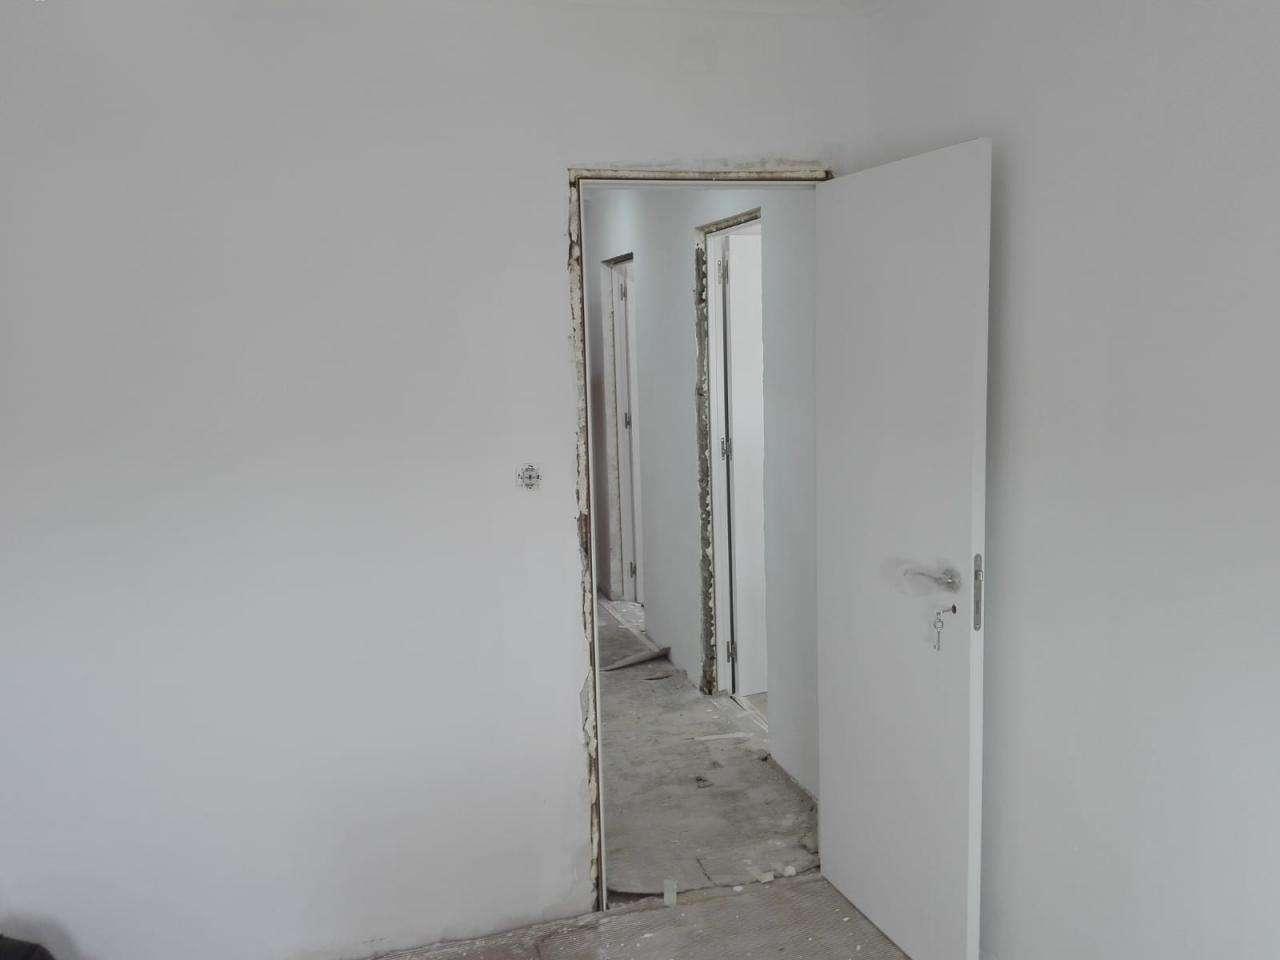 Apartamento para comprar, Falagueira-Venda Nova, Amadora, Lisboa - Foto 2